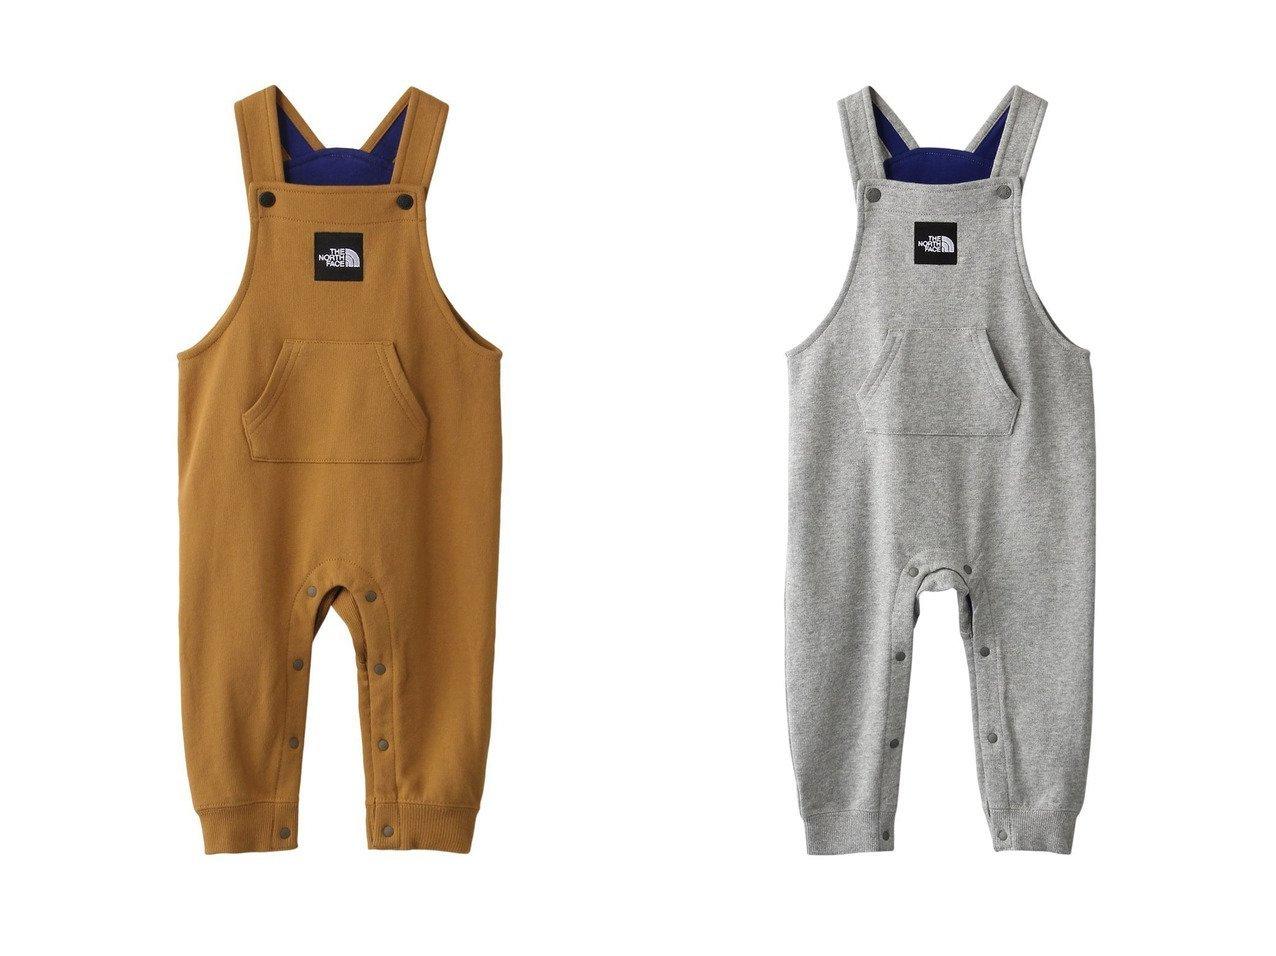 【THE NORTH FACE / KIDS/ザ ノース フェイス】の【BABY】スウェットロゴオーバーオール 【BABY】ベビー服のおすすめ!人気、キッズファッションの通販  おすすめで人気の流行・トレンド、ファッションの通販商品 メンズファッション・キッズファッション・インテリア・家具・レディースファッション・服の通販 founy(ファニー) https://founy.com/ ファッション Fashion キッズファッション KIDS ボトムス Bottoms Kids 2021年 2021 2021 春夏 S/S SS Spring/Summer 2021 S/S 春夏 SS Spring/Summer なめらか フロント ベビー ポケット 春 Spring |ID:crp329100000024356